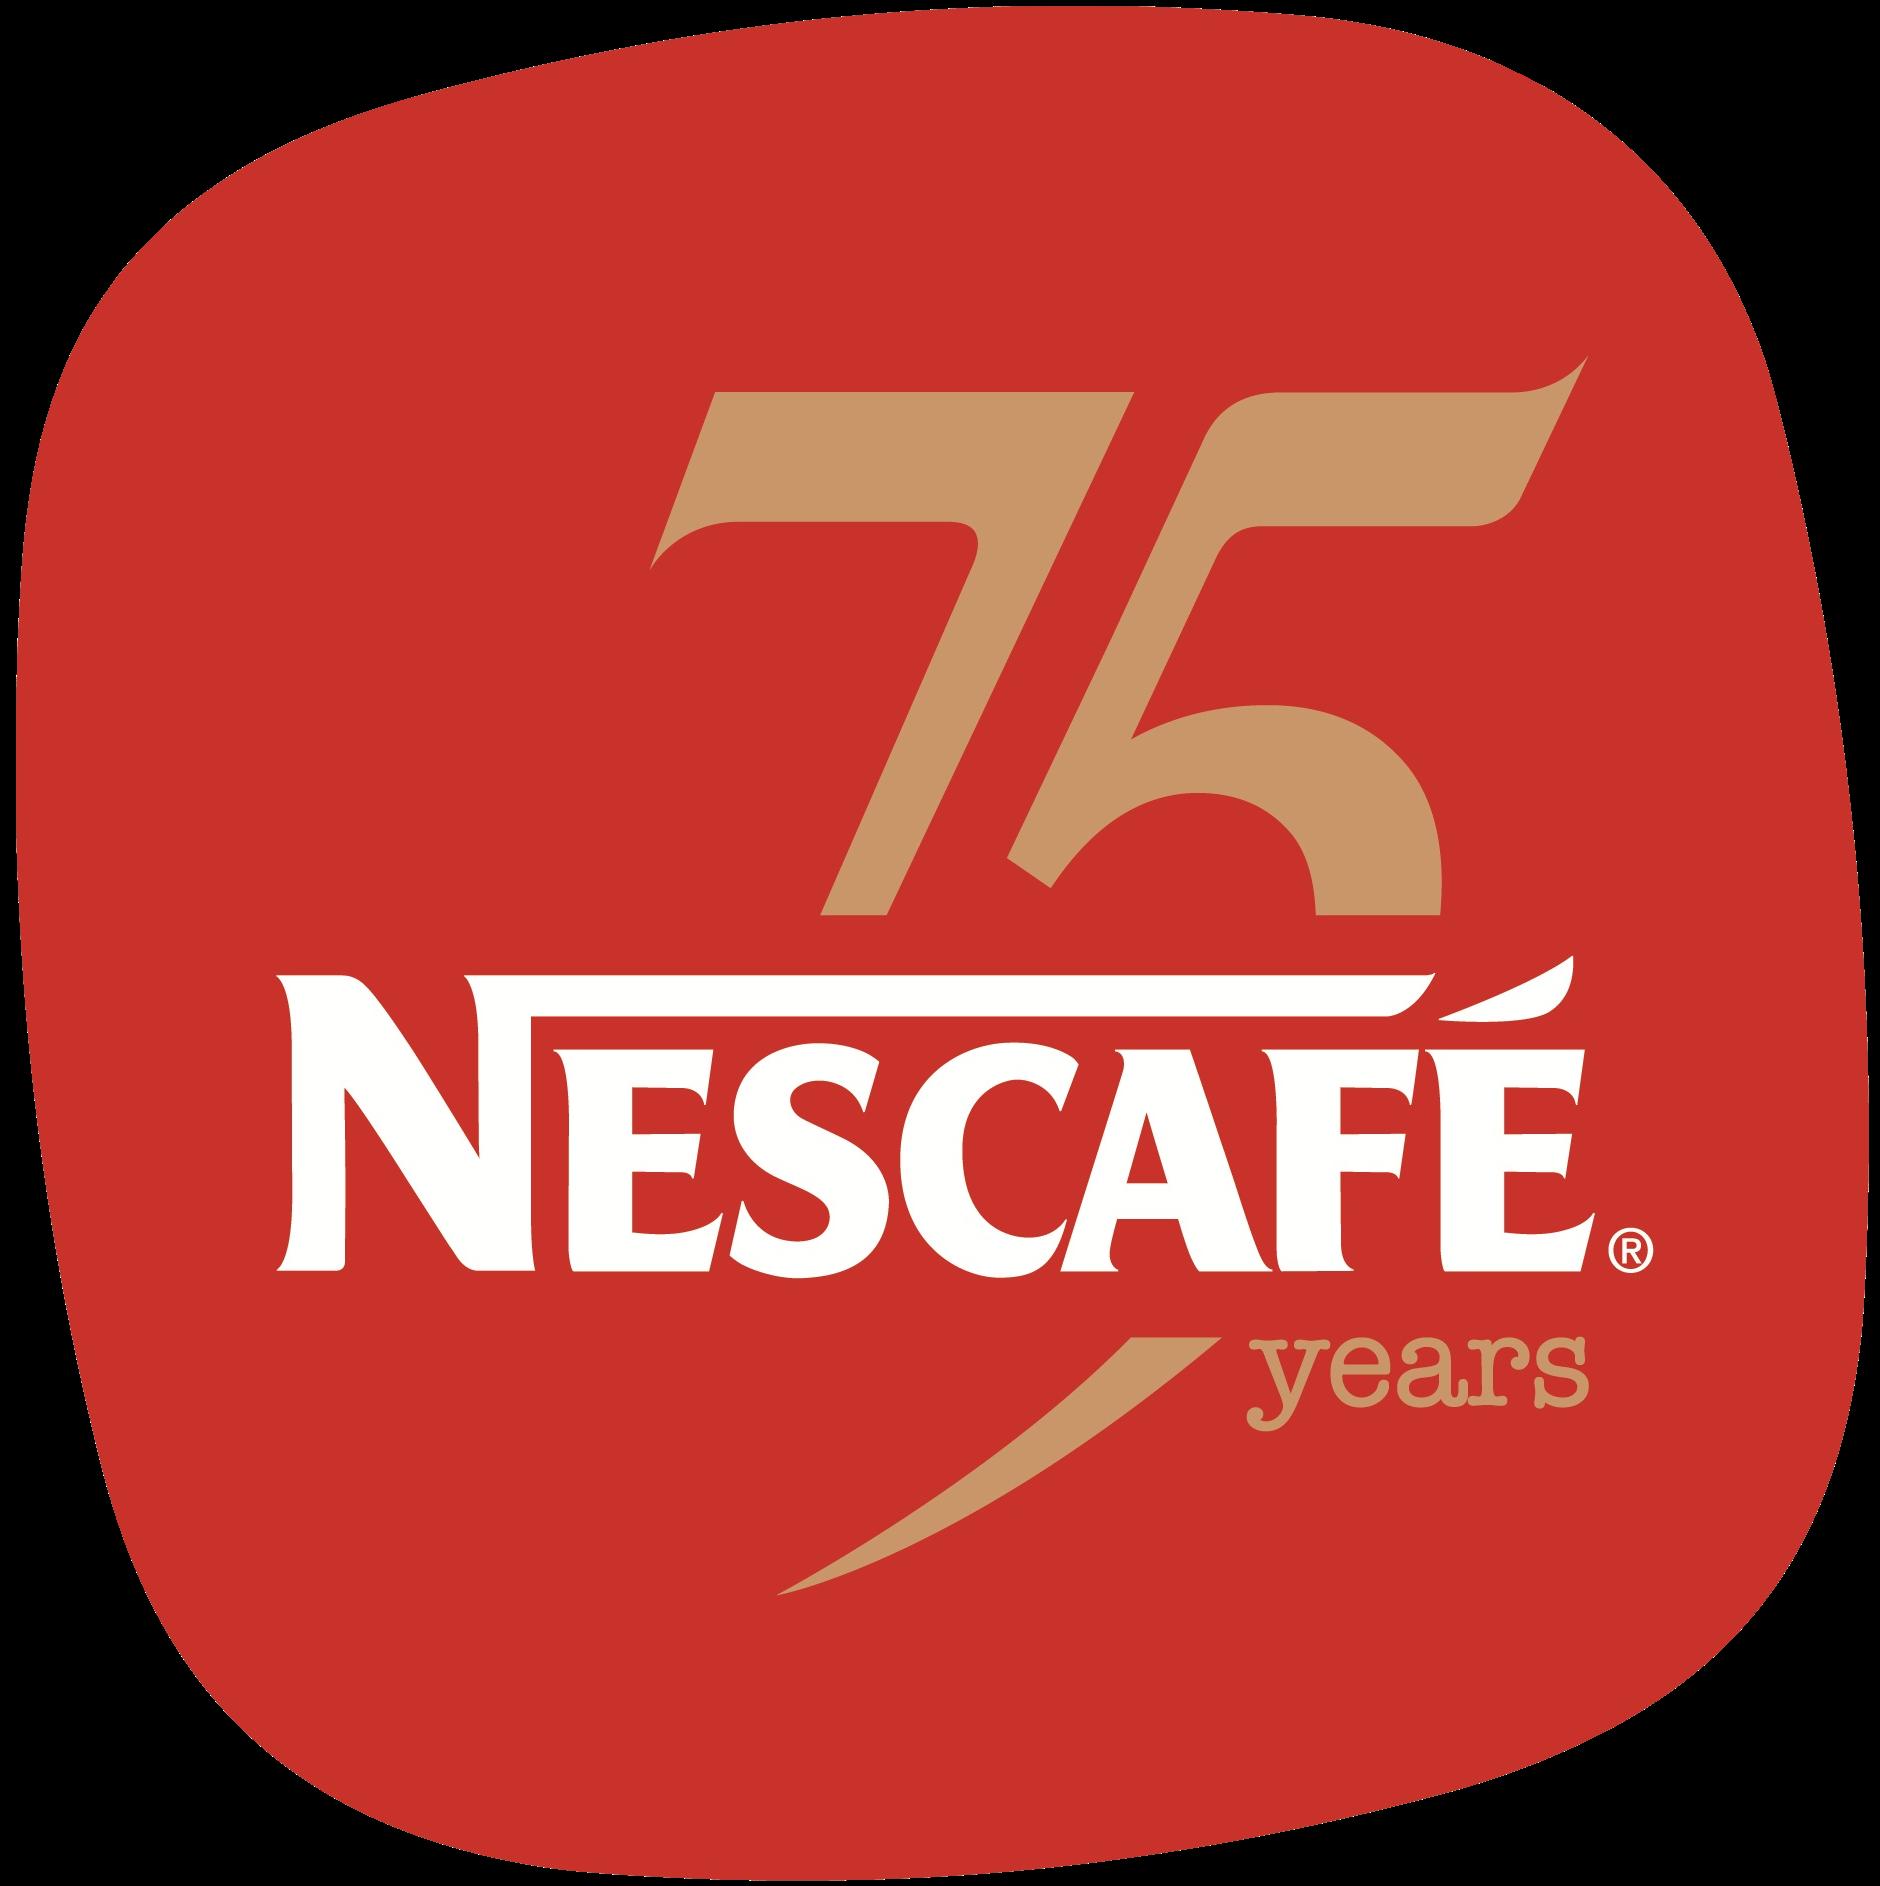 nestle anniversary logo Поиск в Google … Anniversary